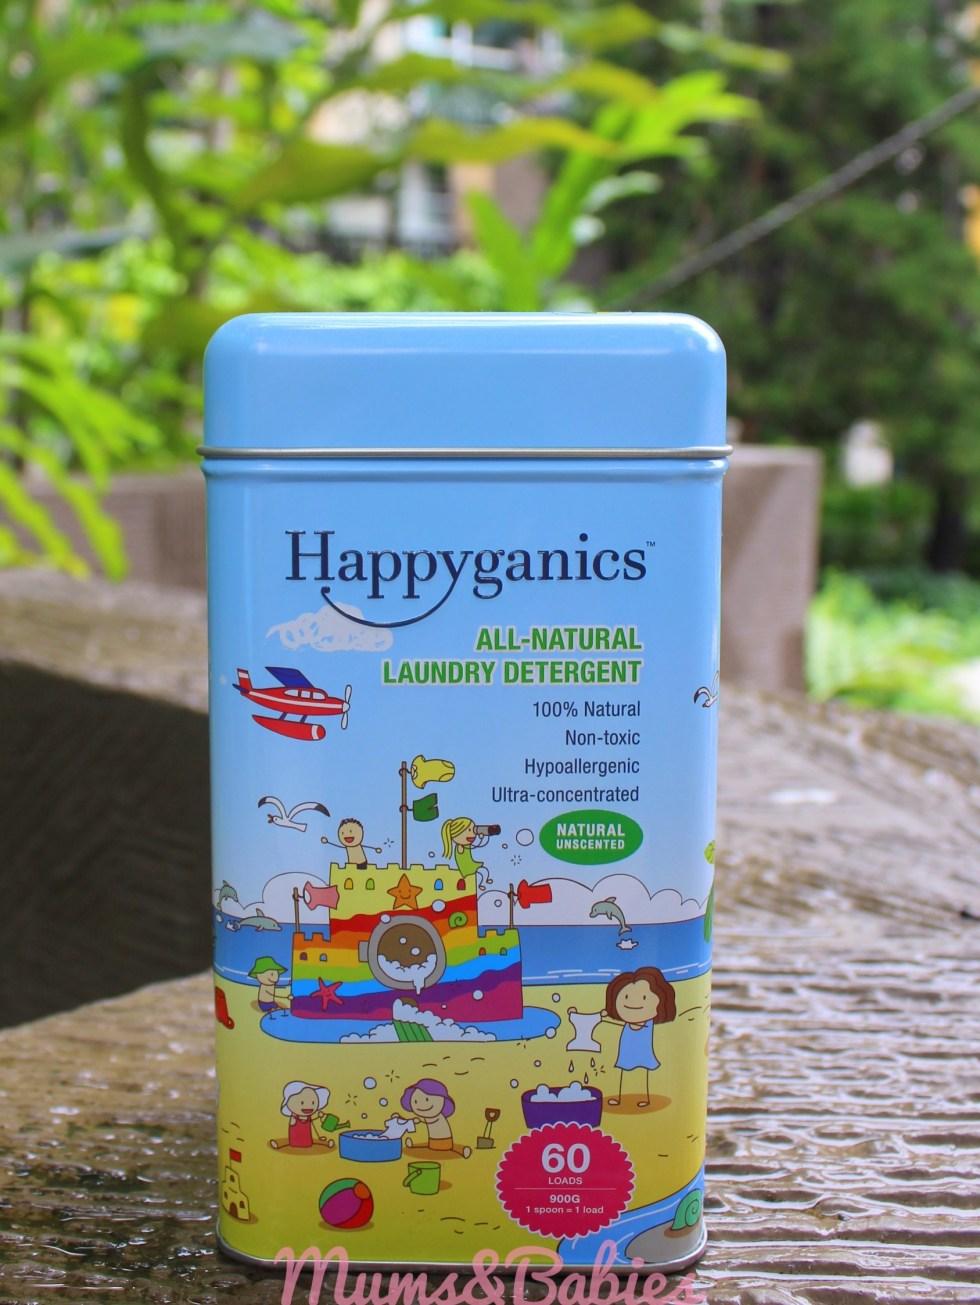 Happyganics5-01